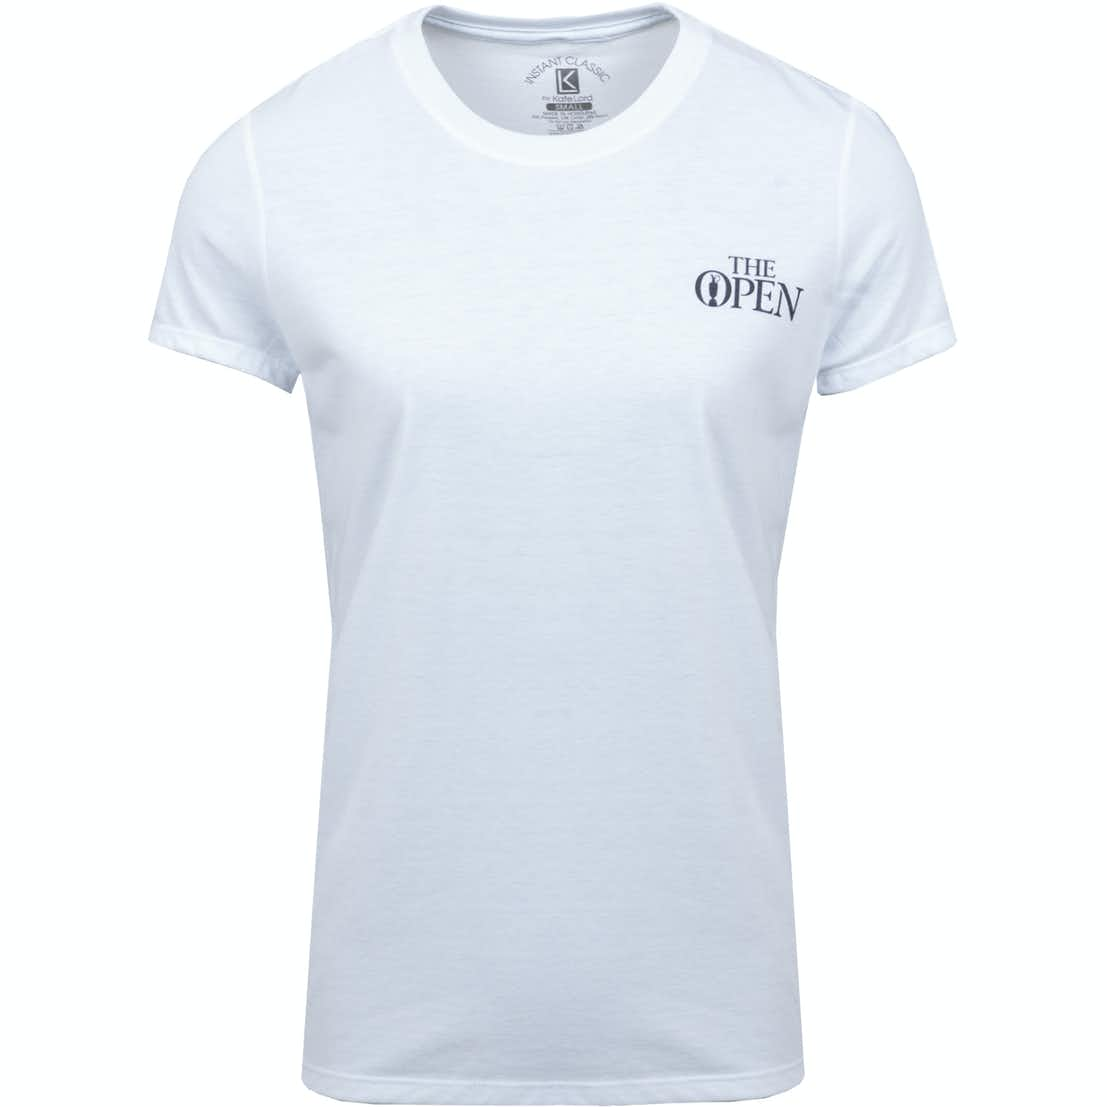 The Open T-Shirt - White